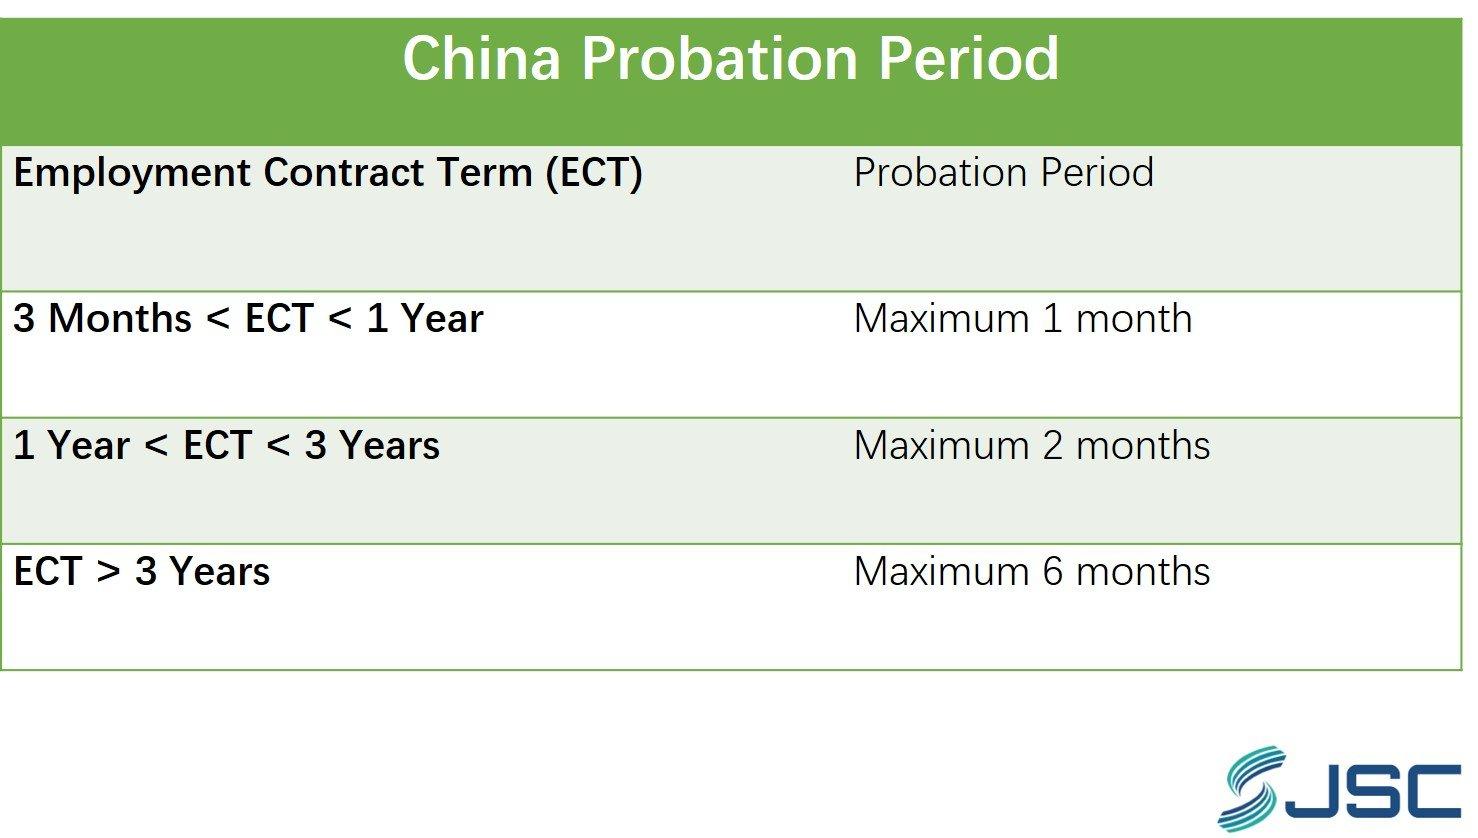 China Probation Period